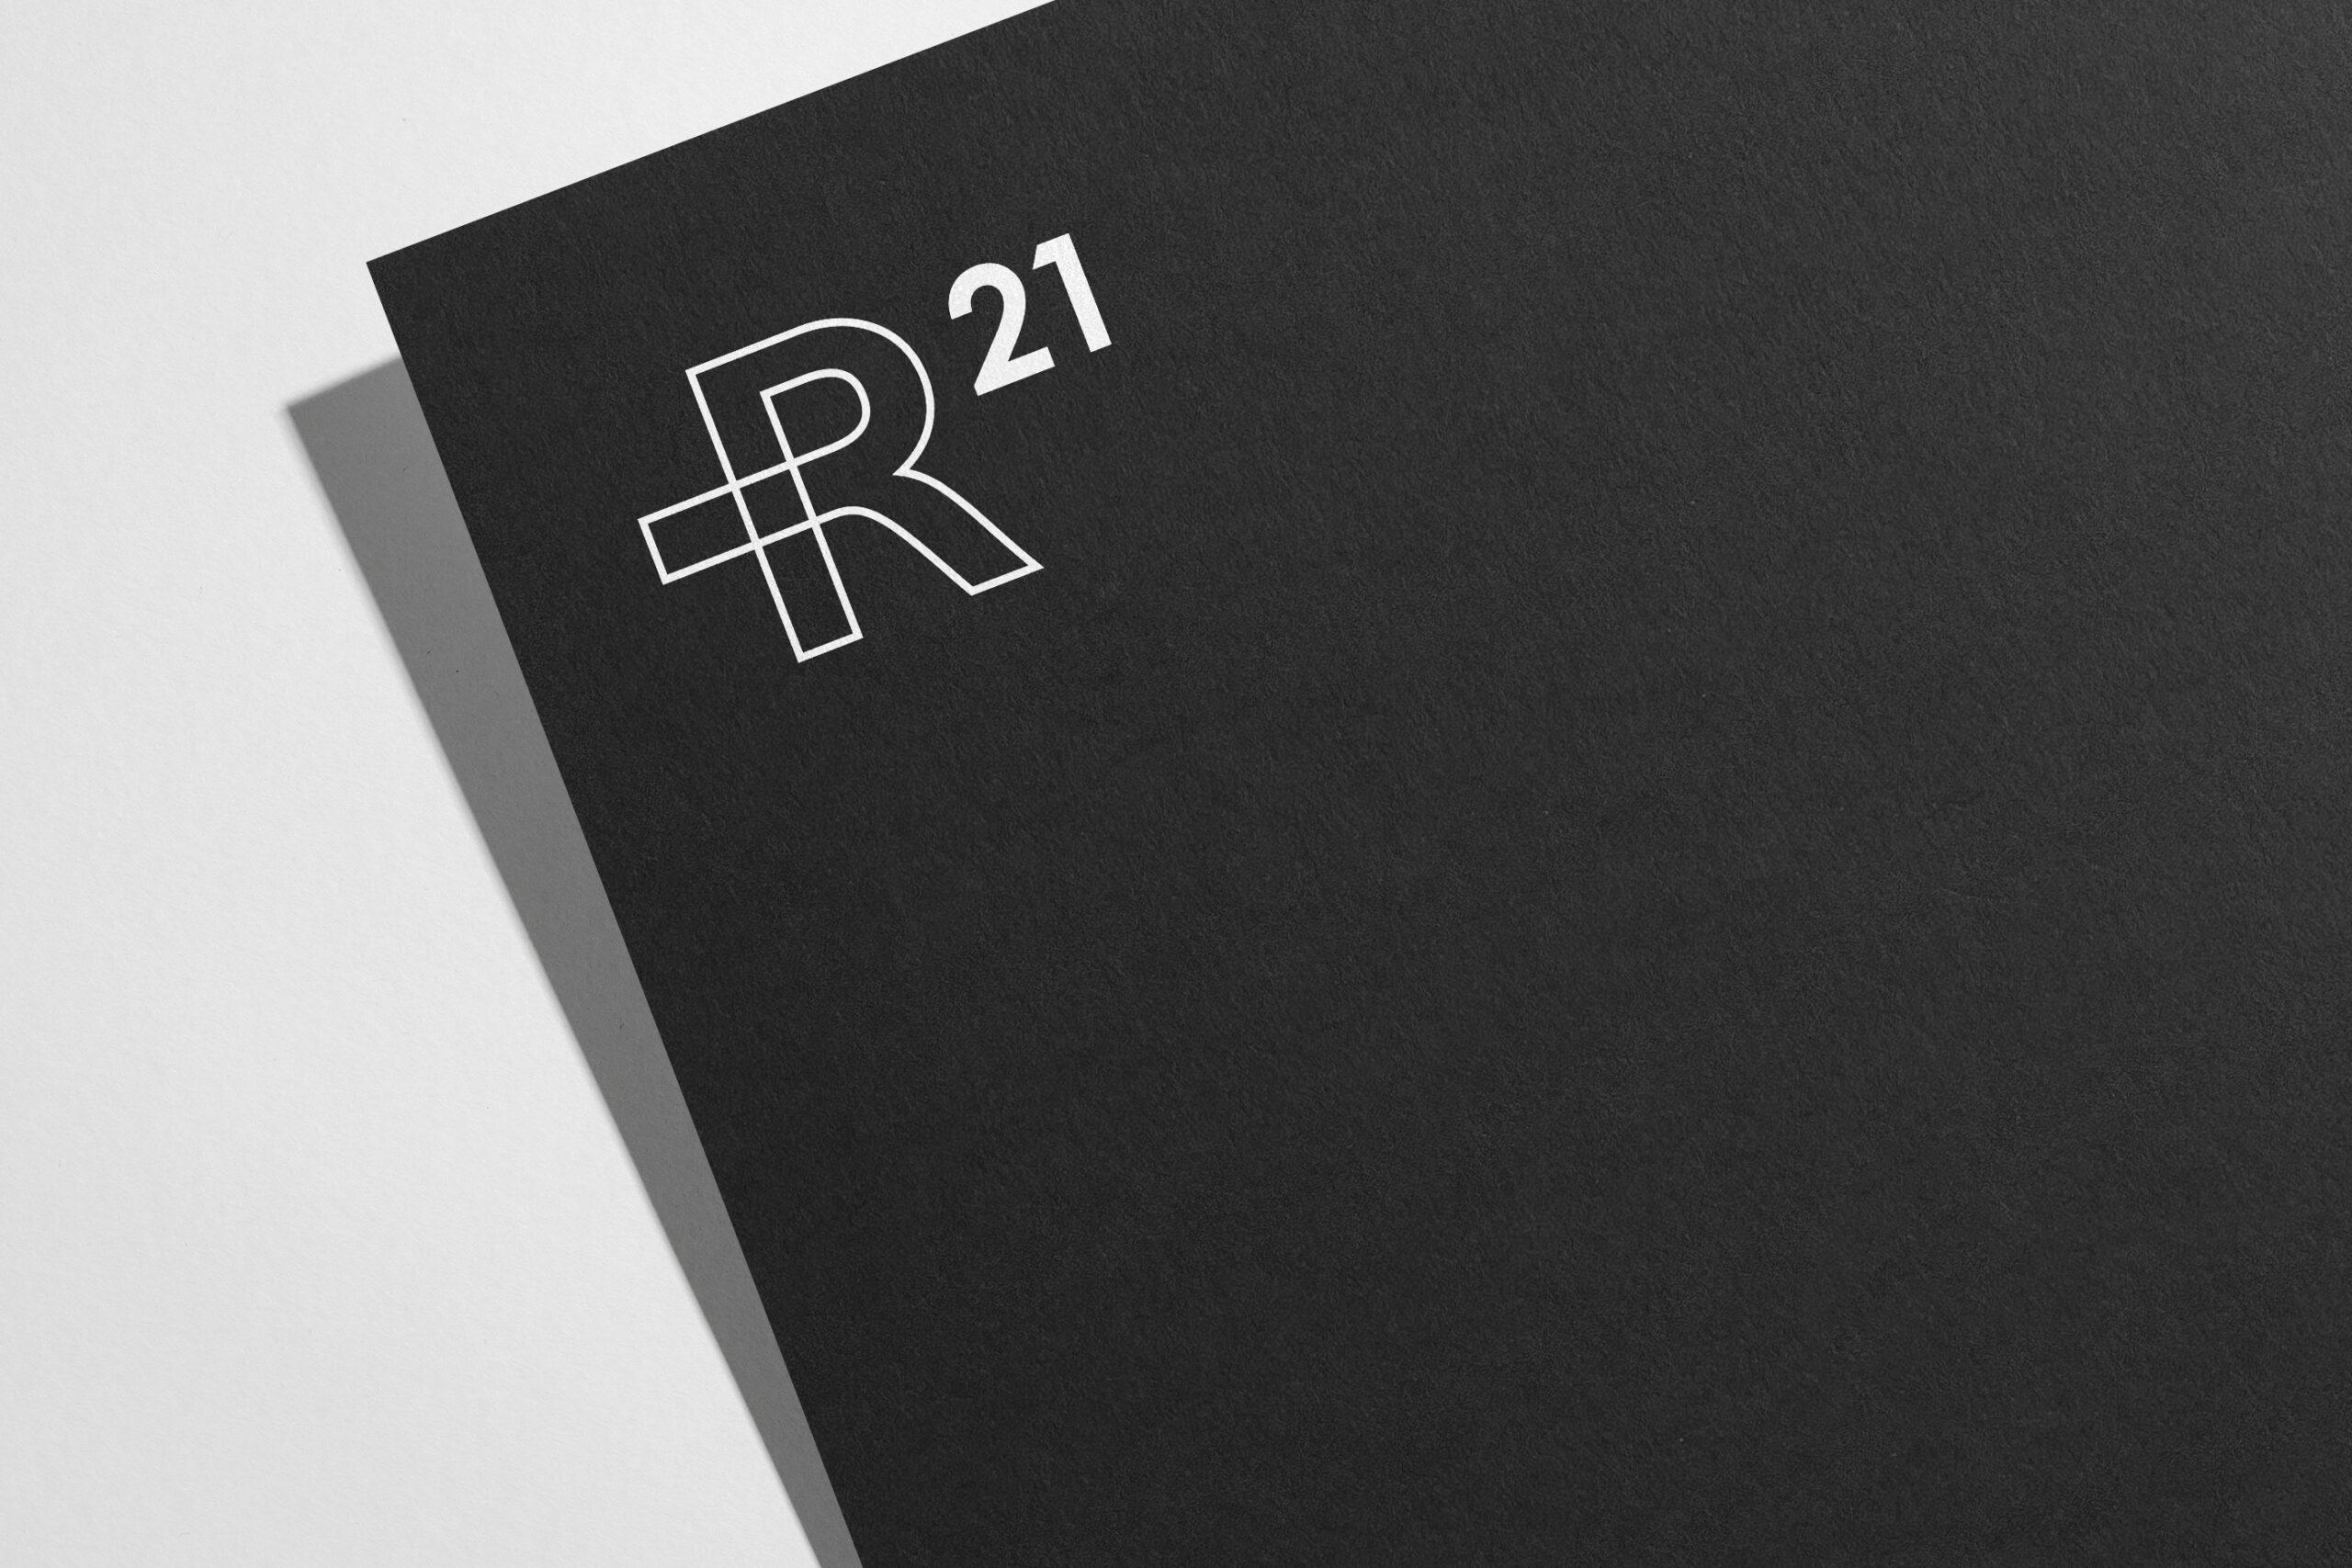 paper_R21